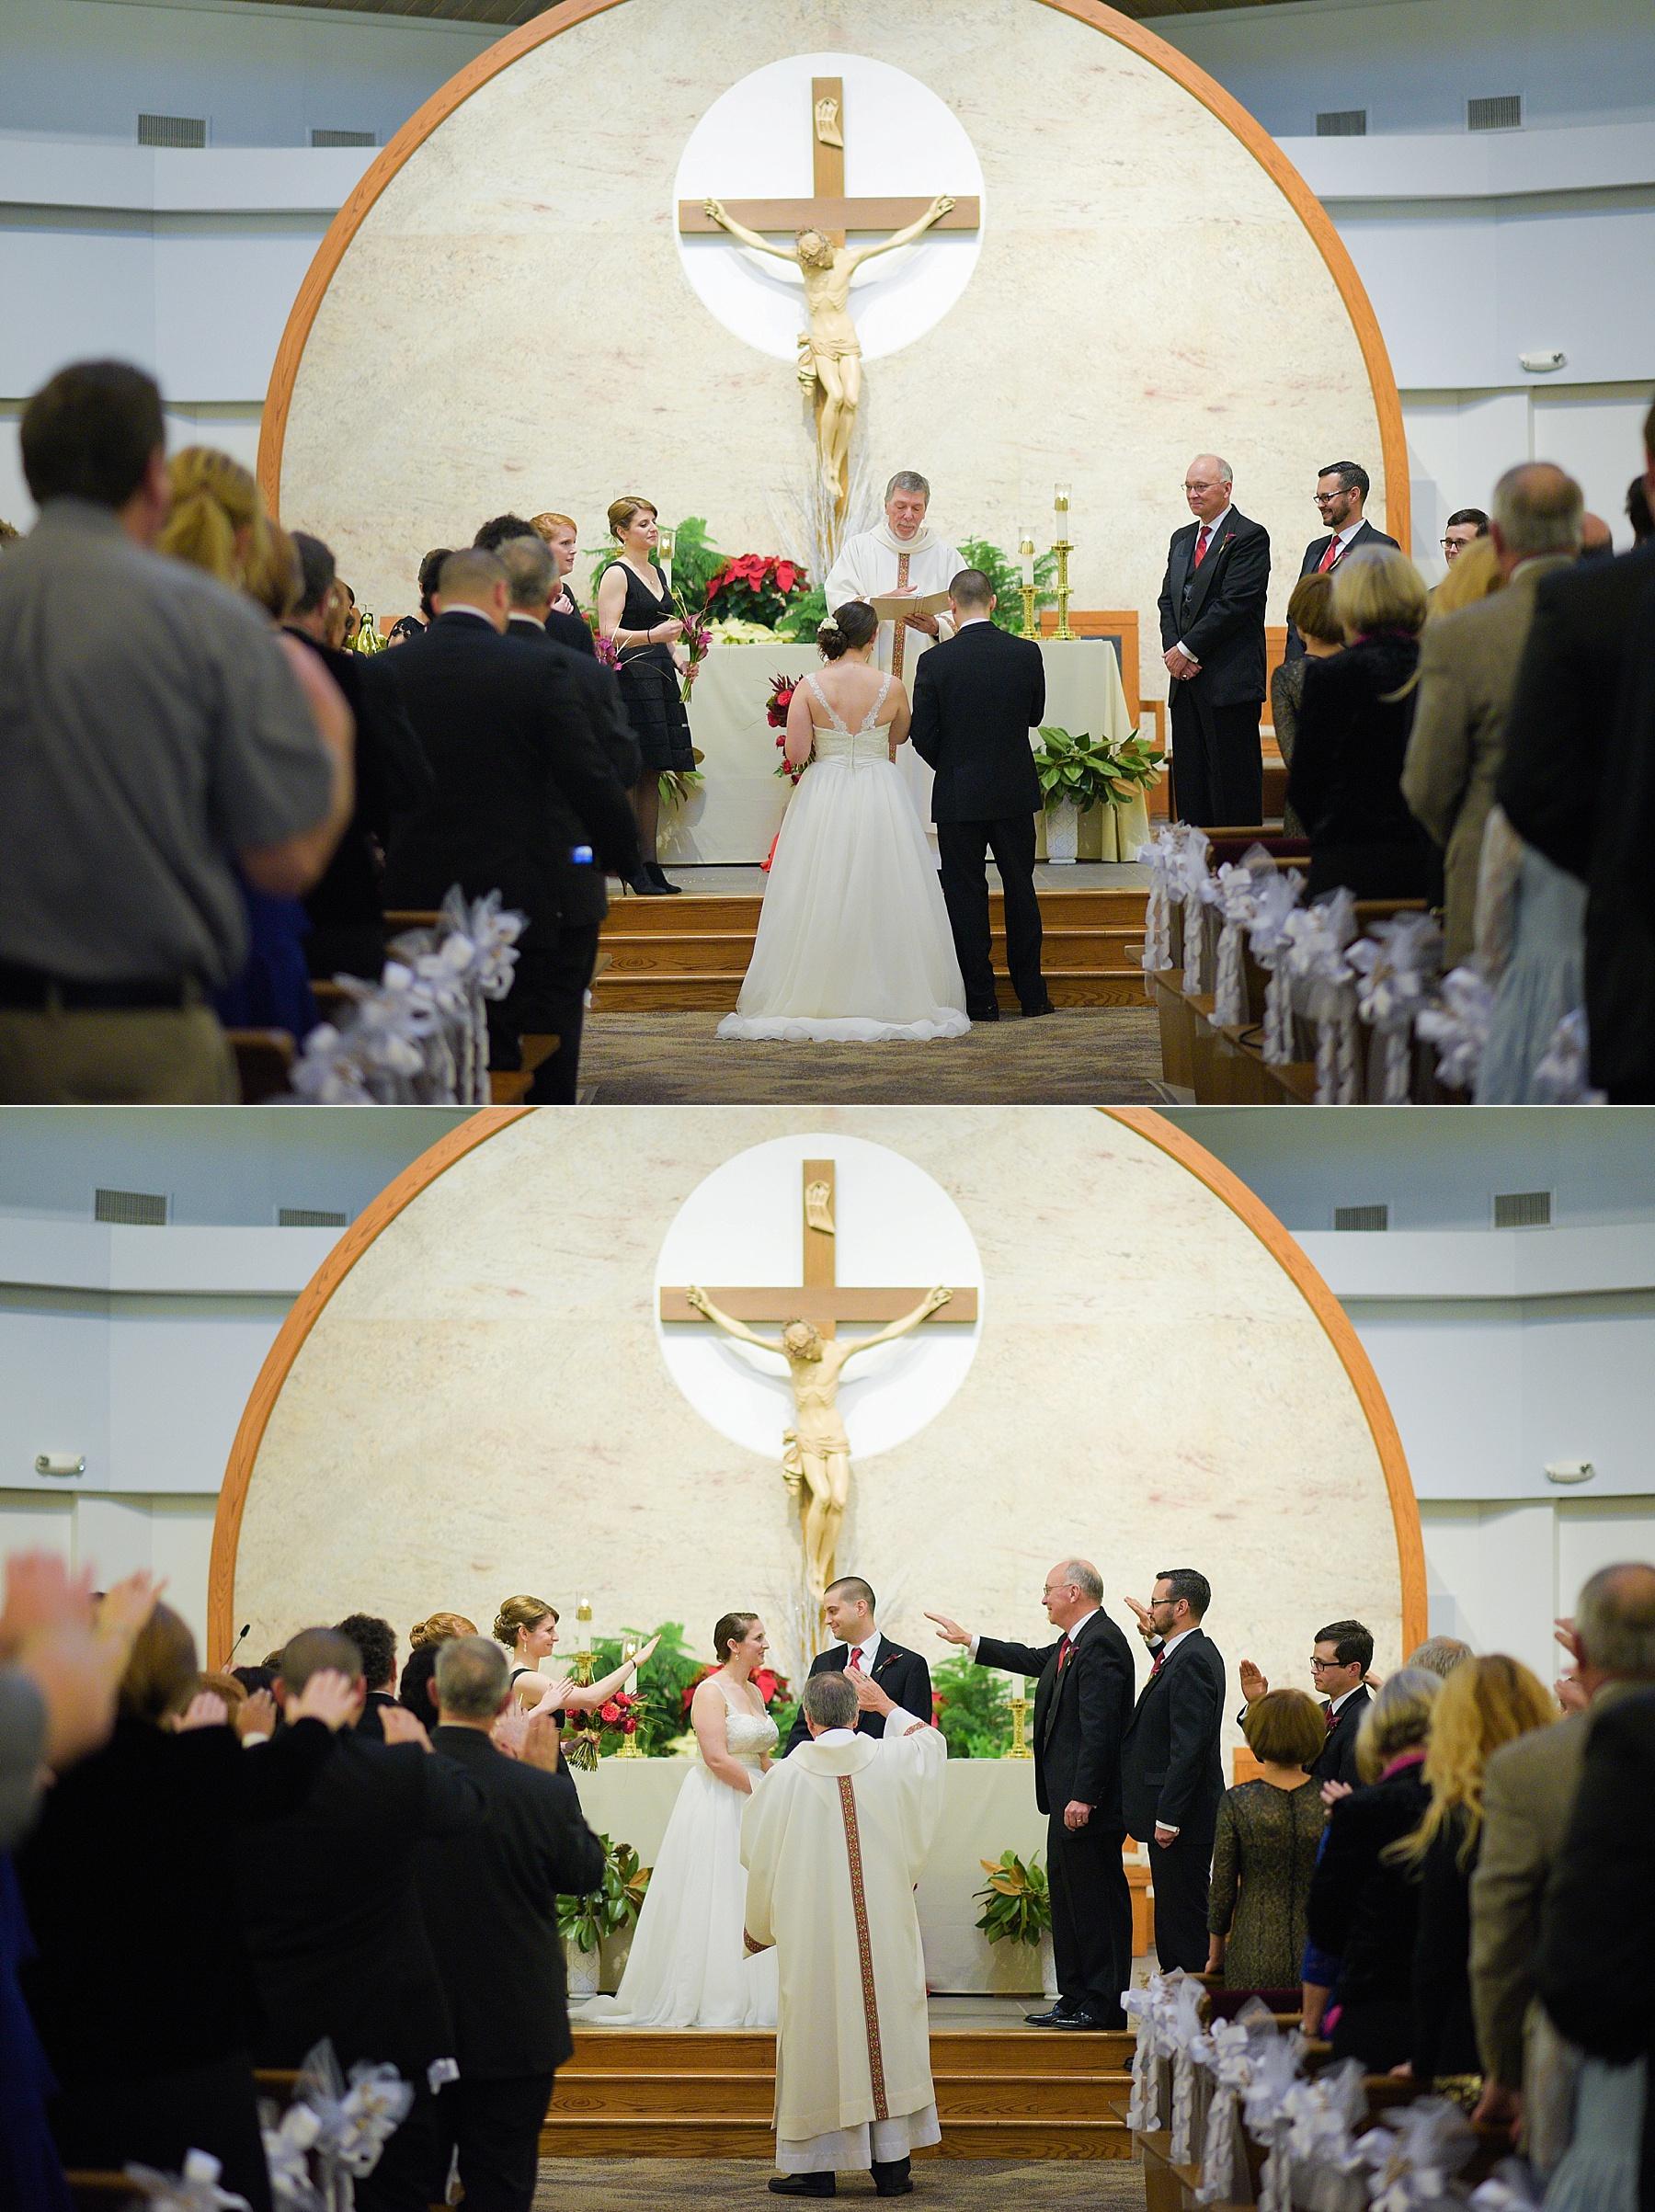 john-marshall-hotel-wedding-richmond-va_0020.jpg